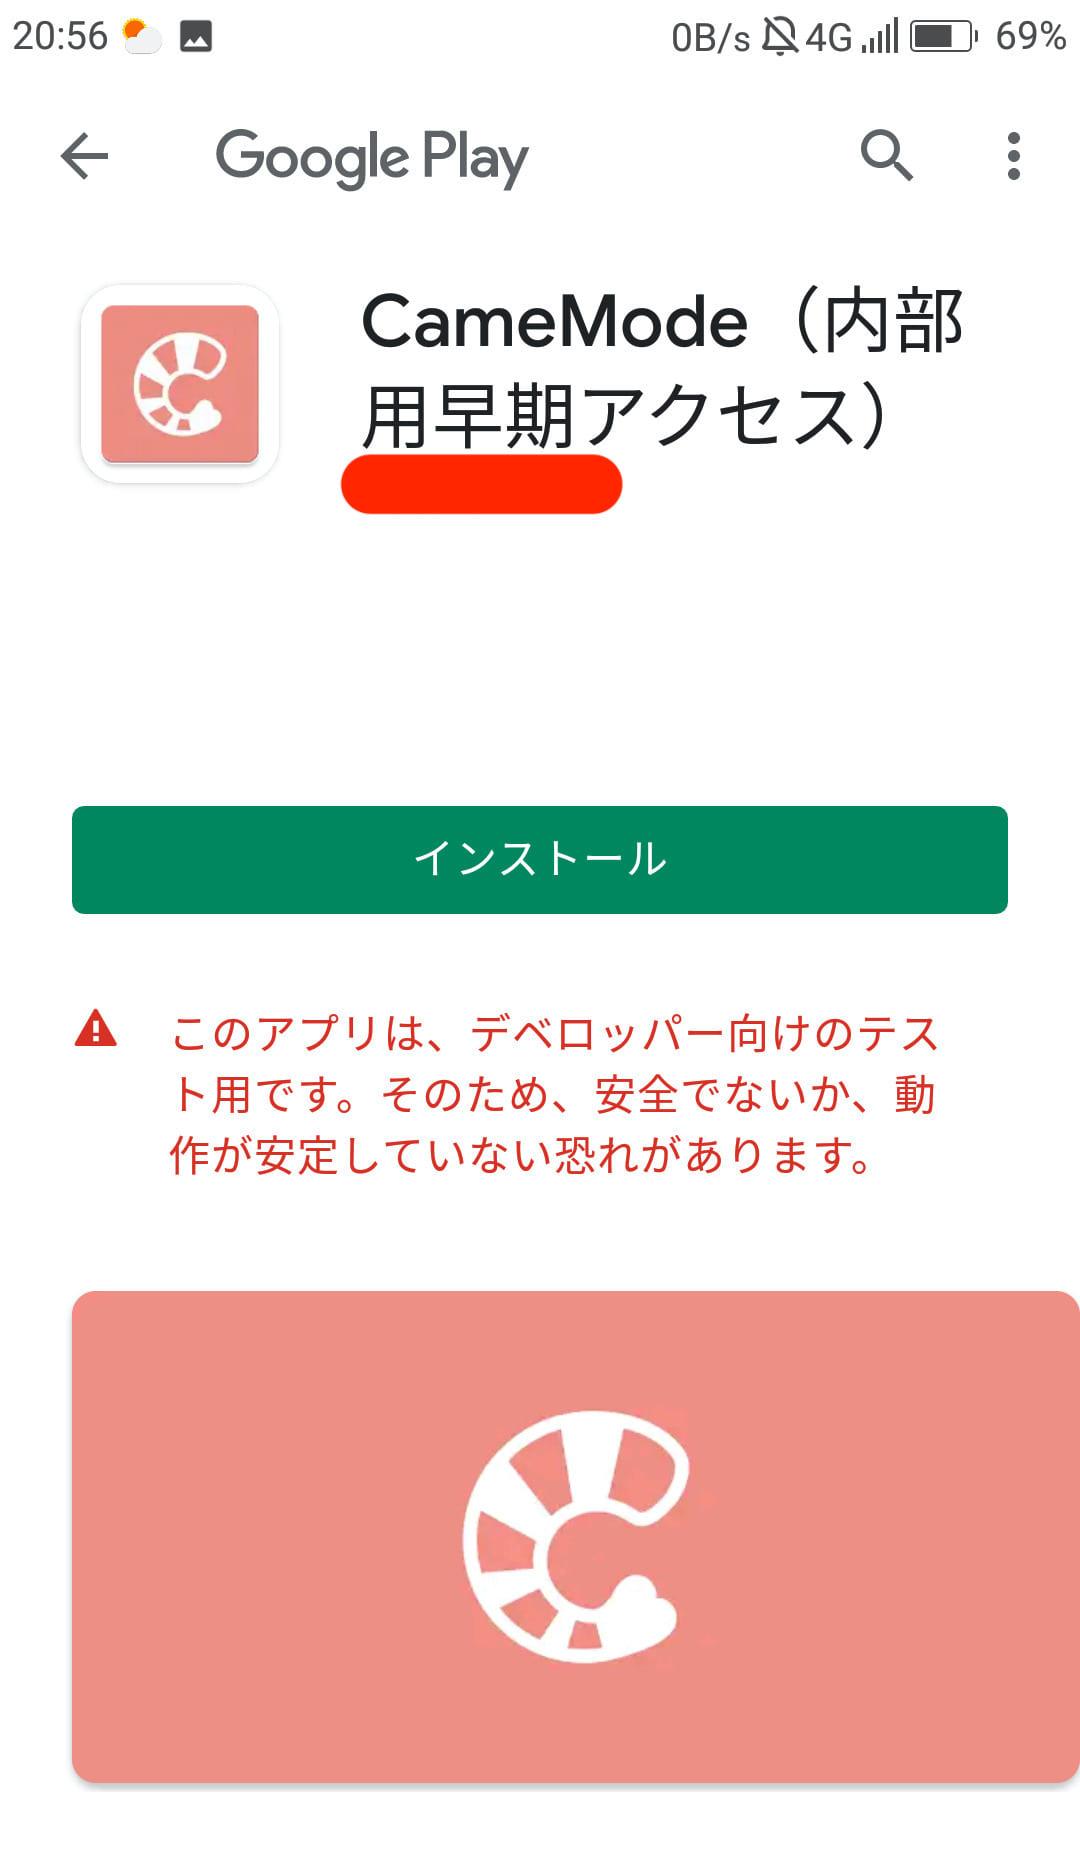 GooglePlayConsoleで内部テストのアプリインストール